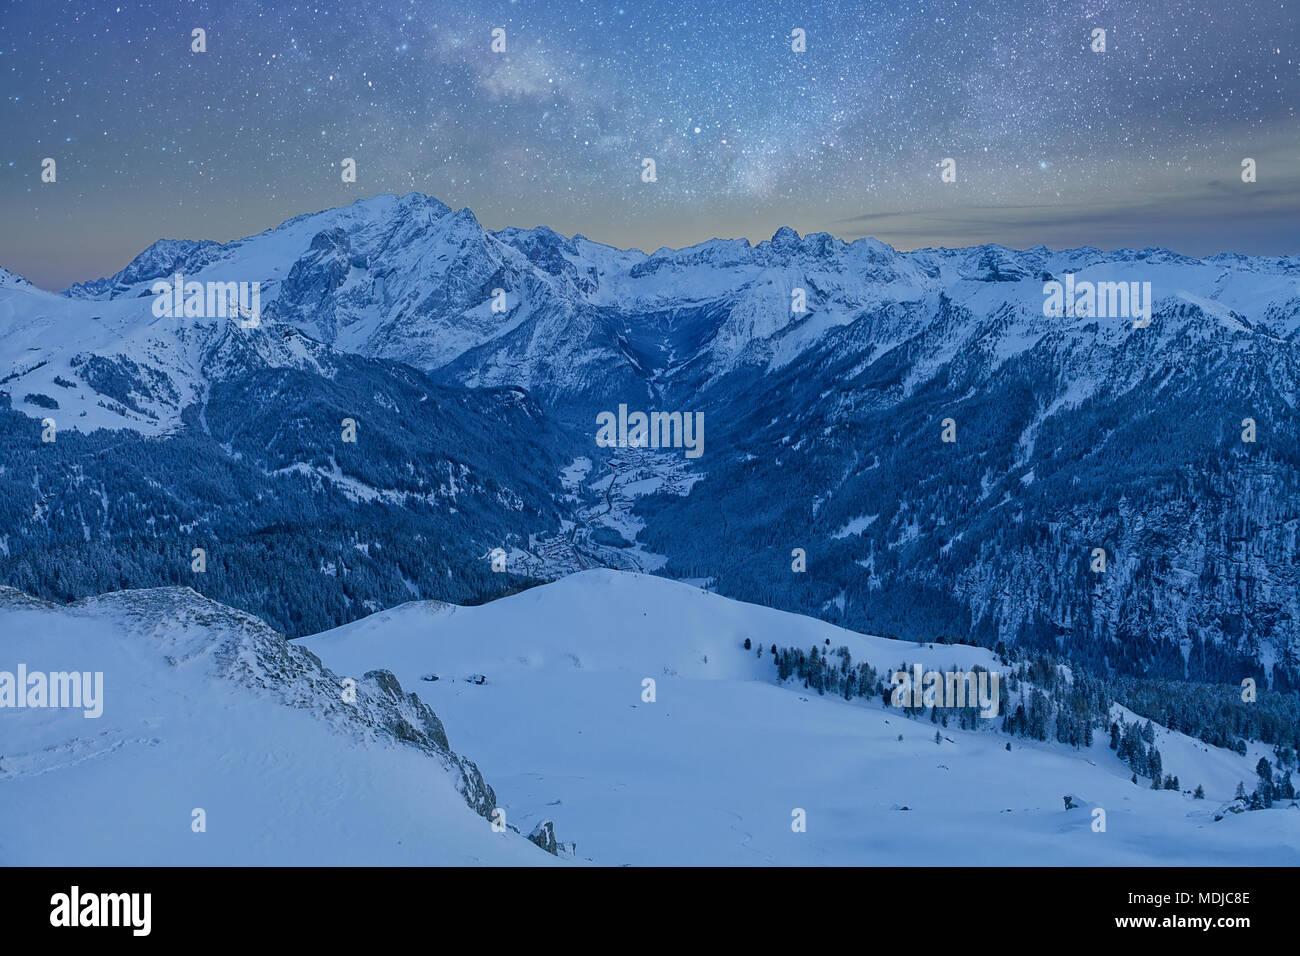 Fantastic starry sky. Panoramic view of the Val Di Fassa ski resort of the Italian Dolomite under starry light. Trentino-Alto-Adige region, Italy - Stock Image